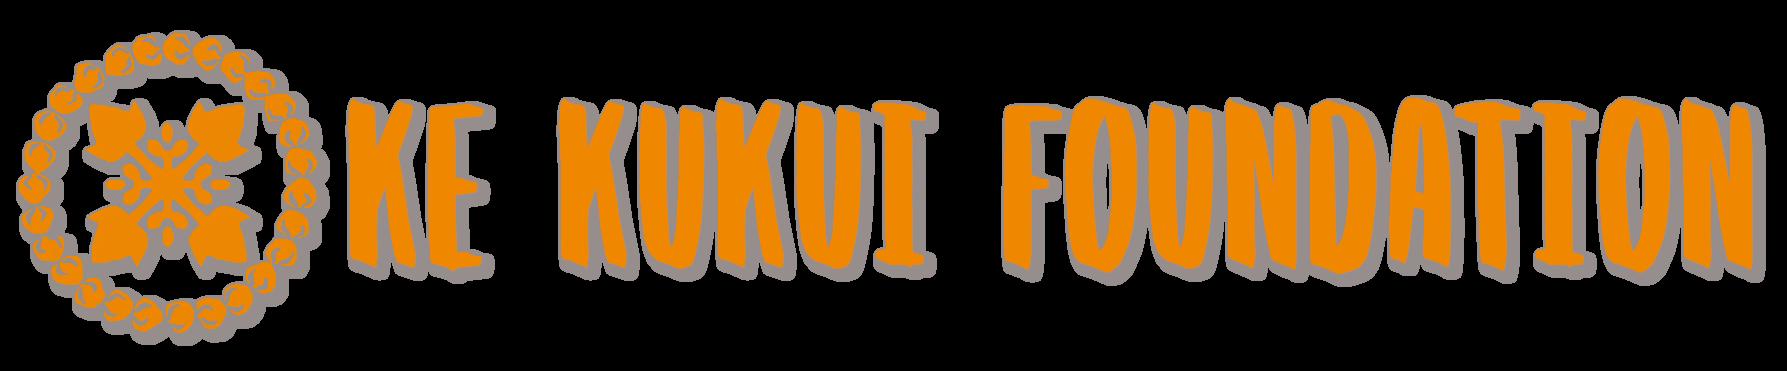 Ke Kukui Foundation